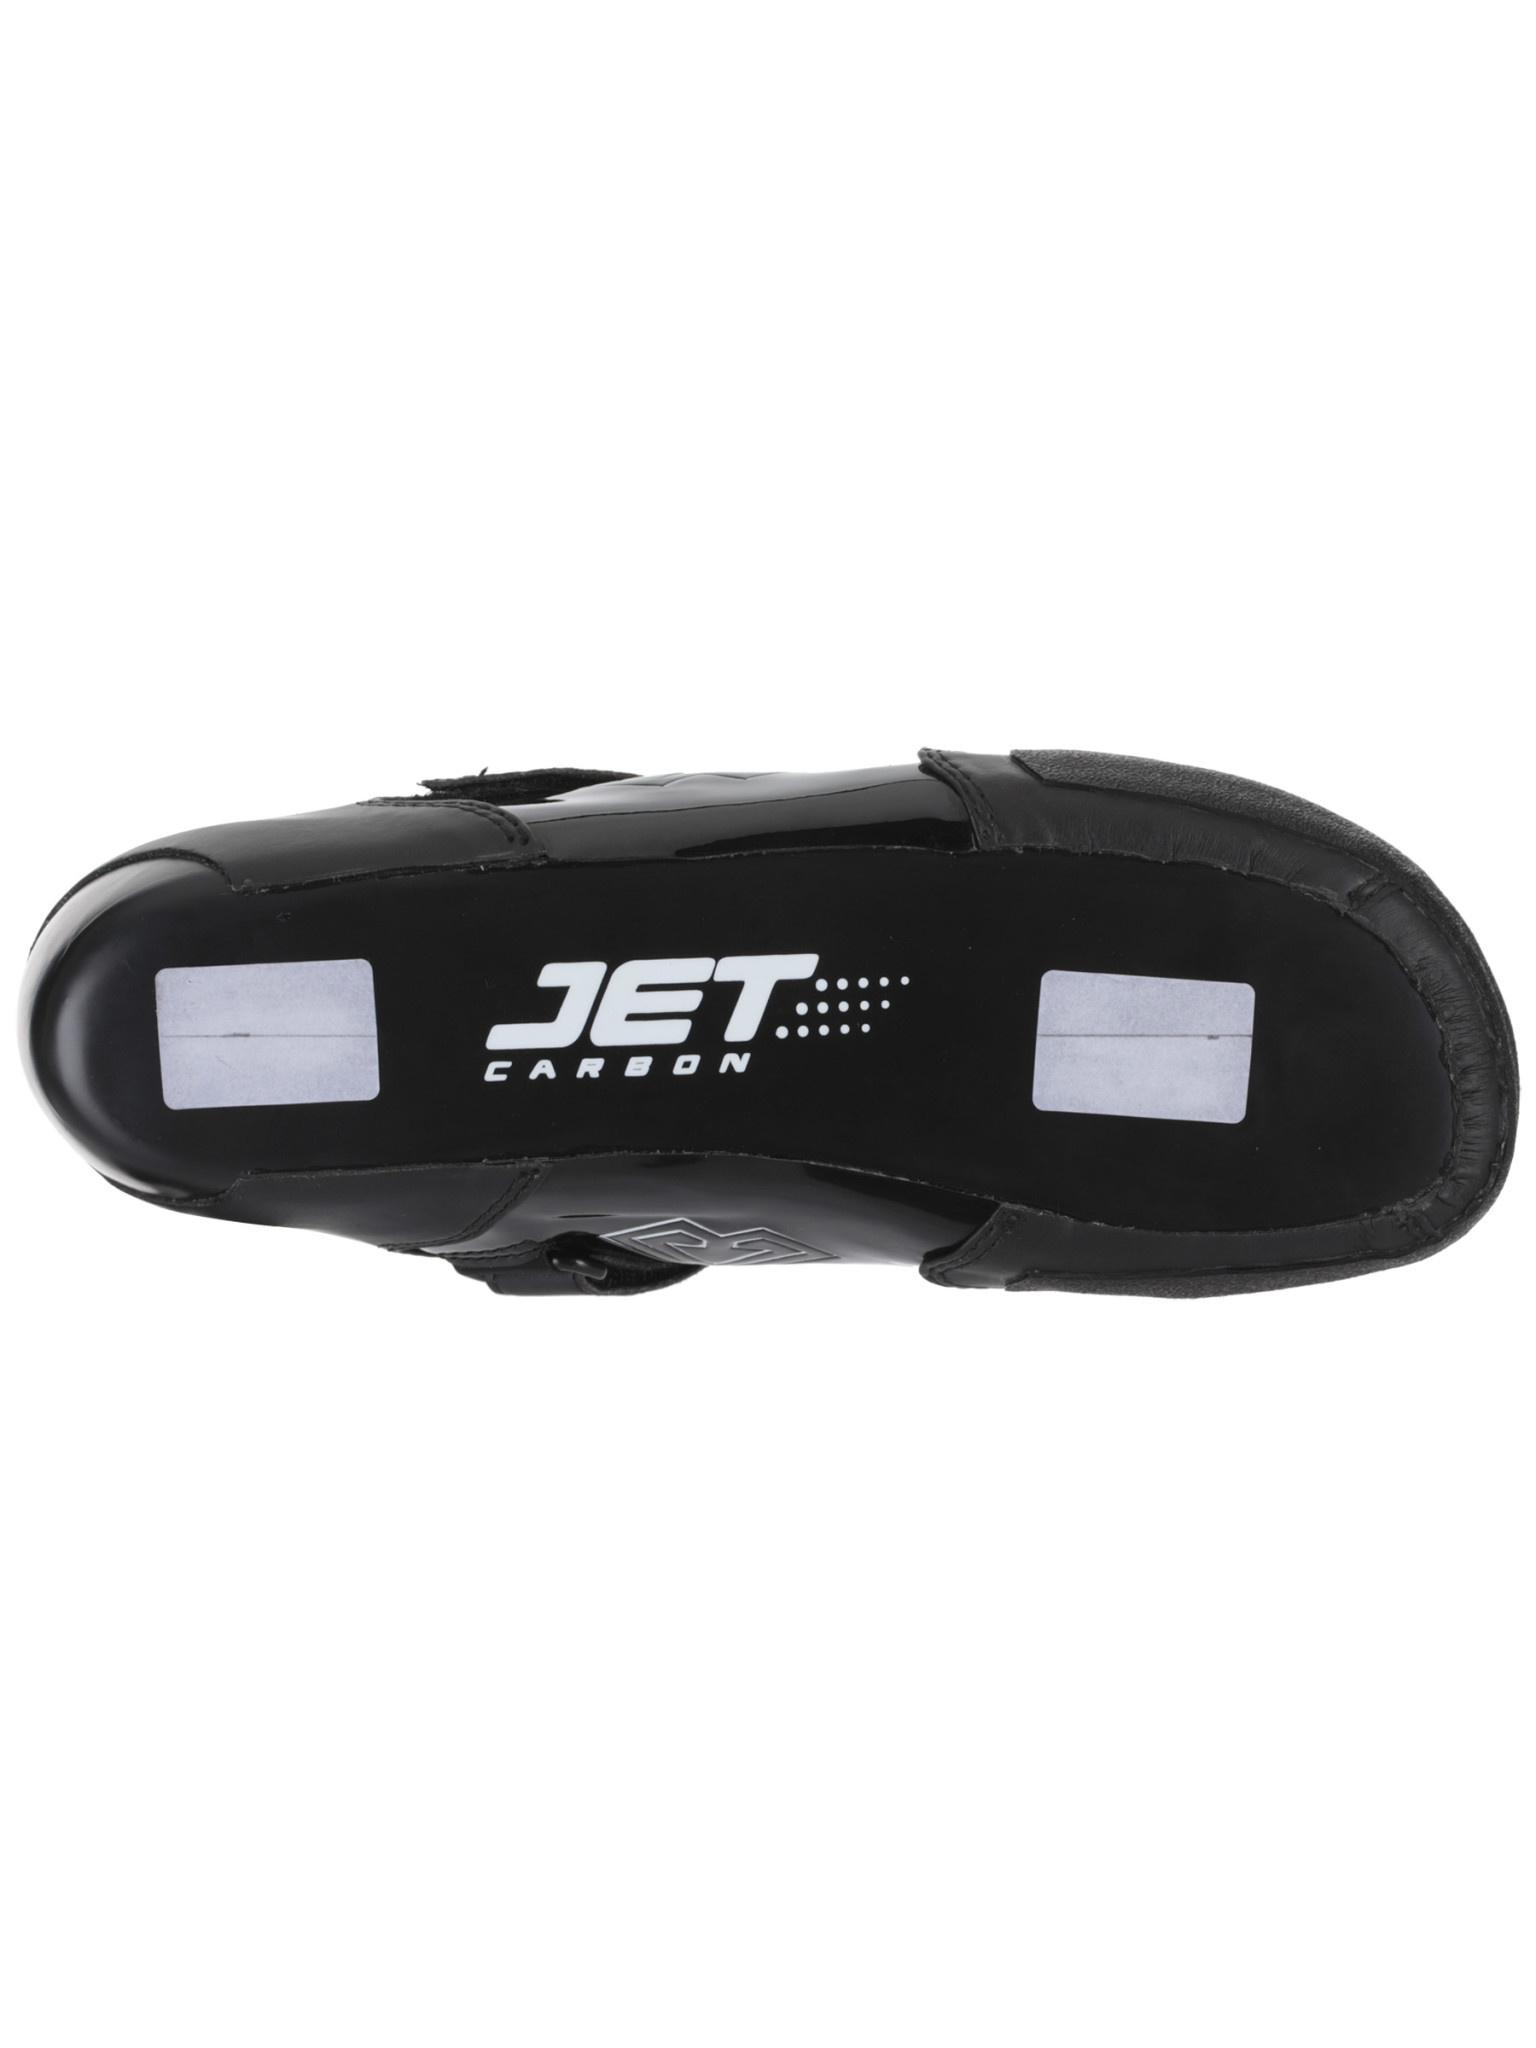 Antik Jet Carbon